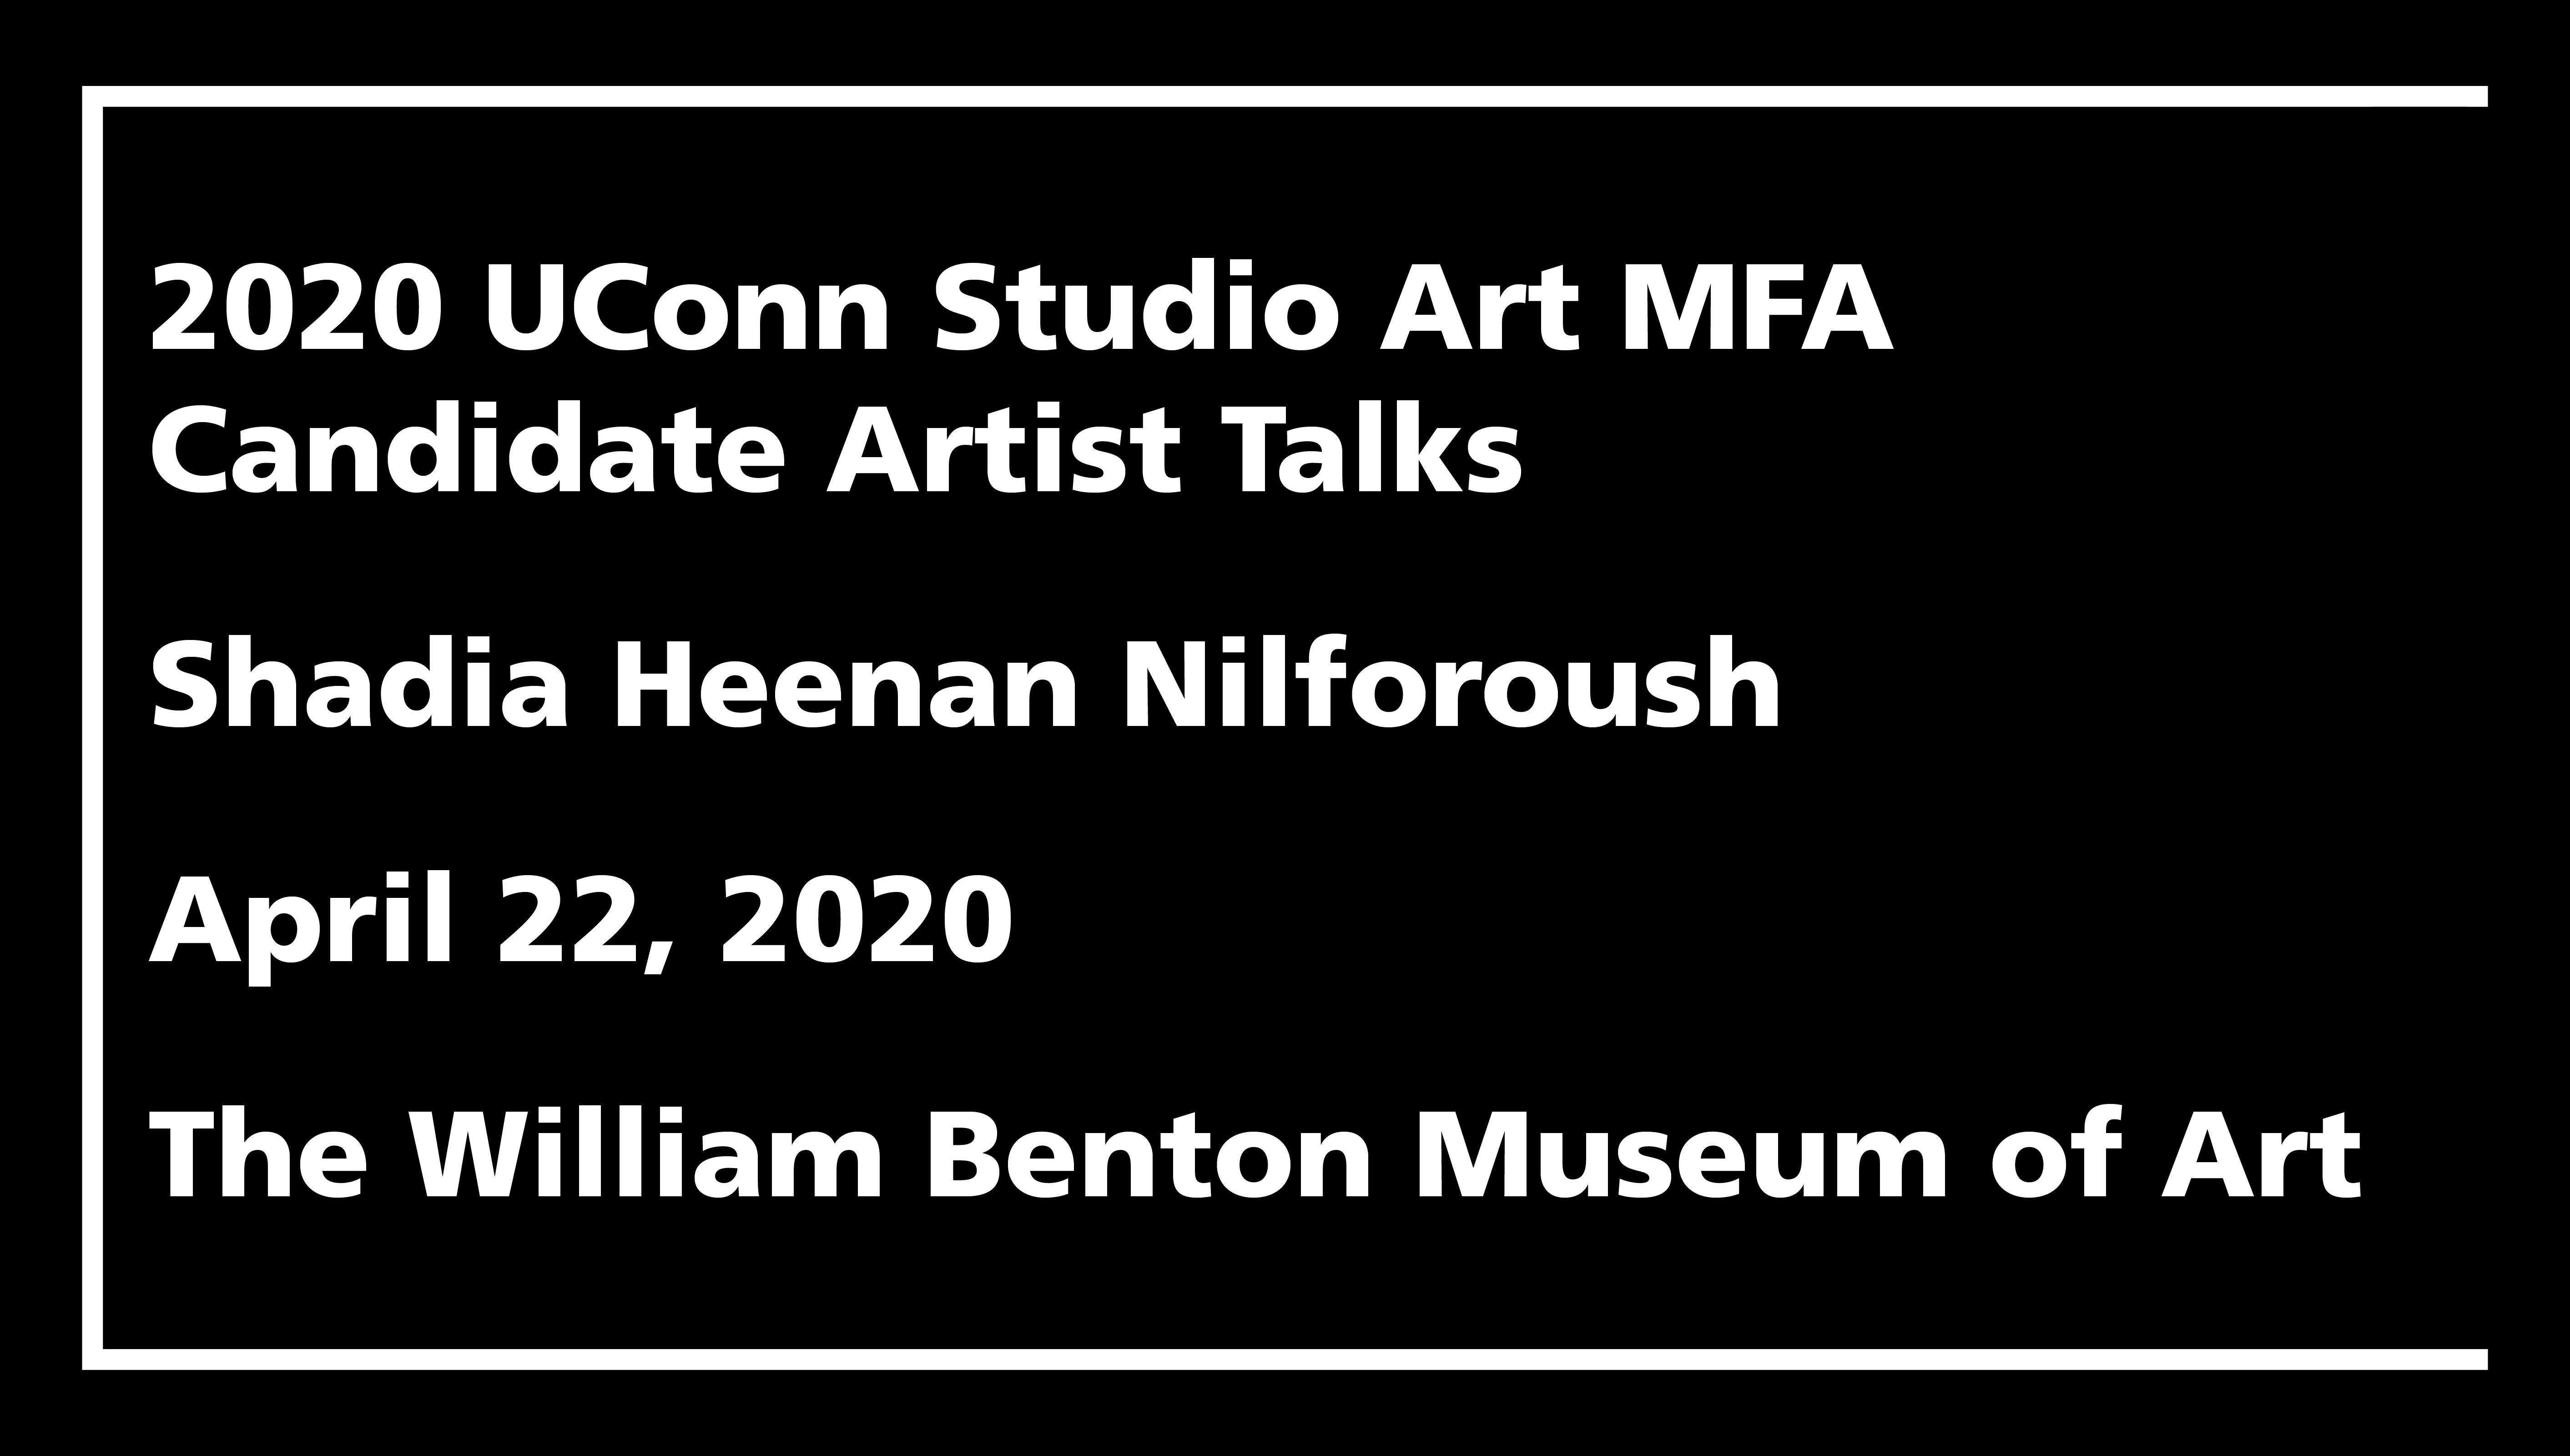 2020 UConn Studio Art MFA Candidate Artist Talks: Shadia Heenan Nilforoush